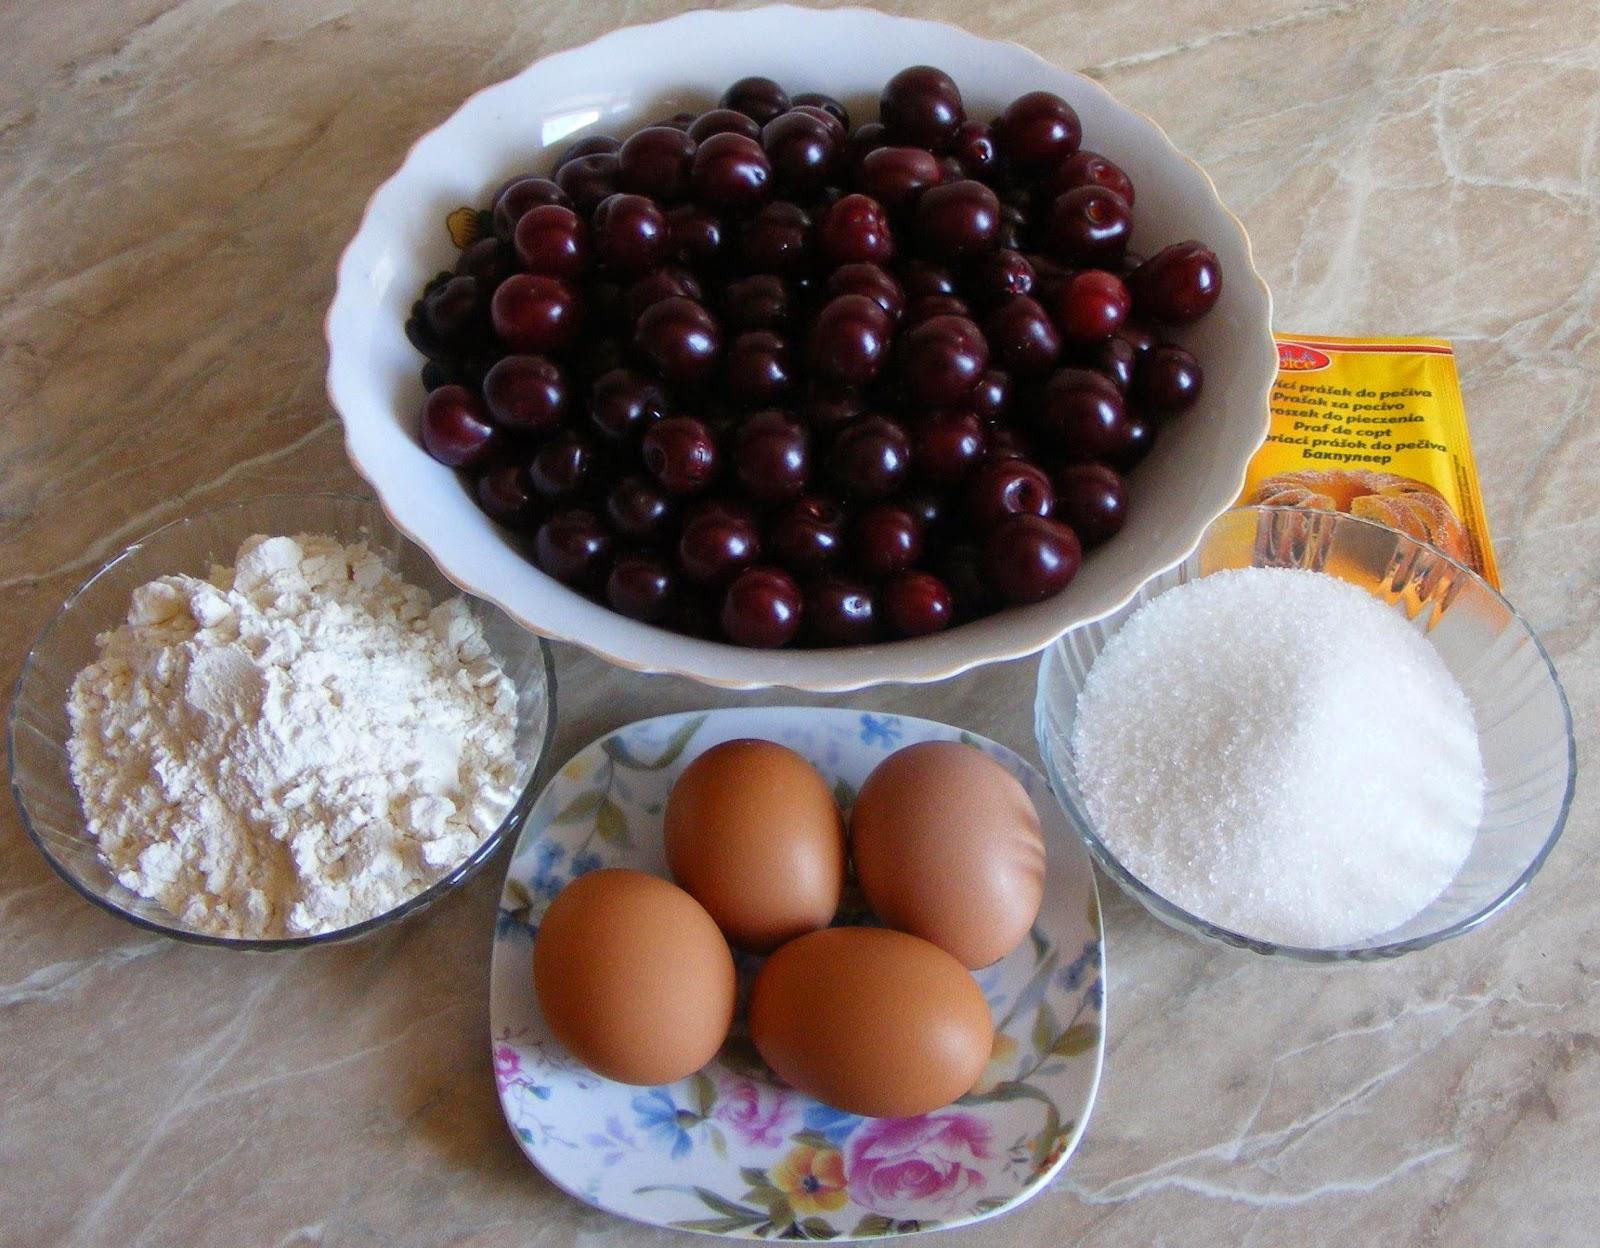 ingrediente pentru tarta cu fructe, ingrediente pentru tarta cu visine, cum se prepara tarta cu fructe, cum facem tarta cu visine, retete si preparate culinare dulciuri si prajituri cu fructe, retete zepter, tarta la zepter,